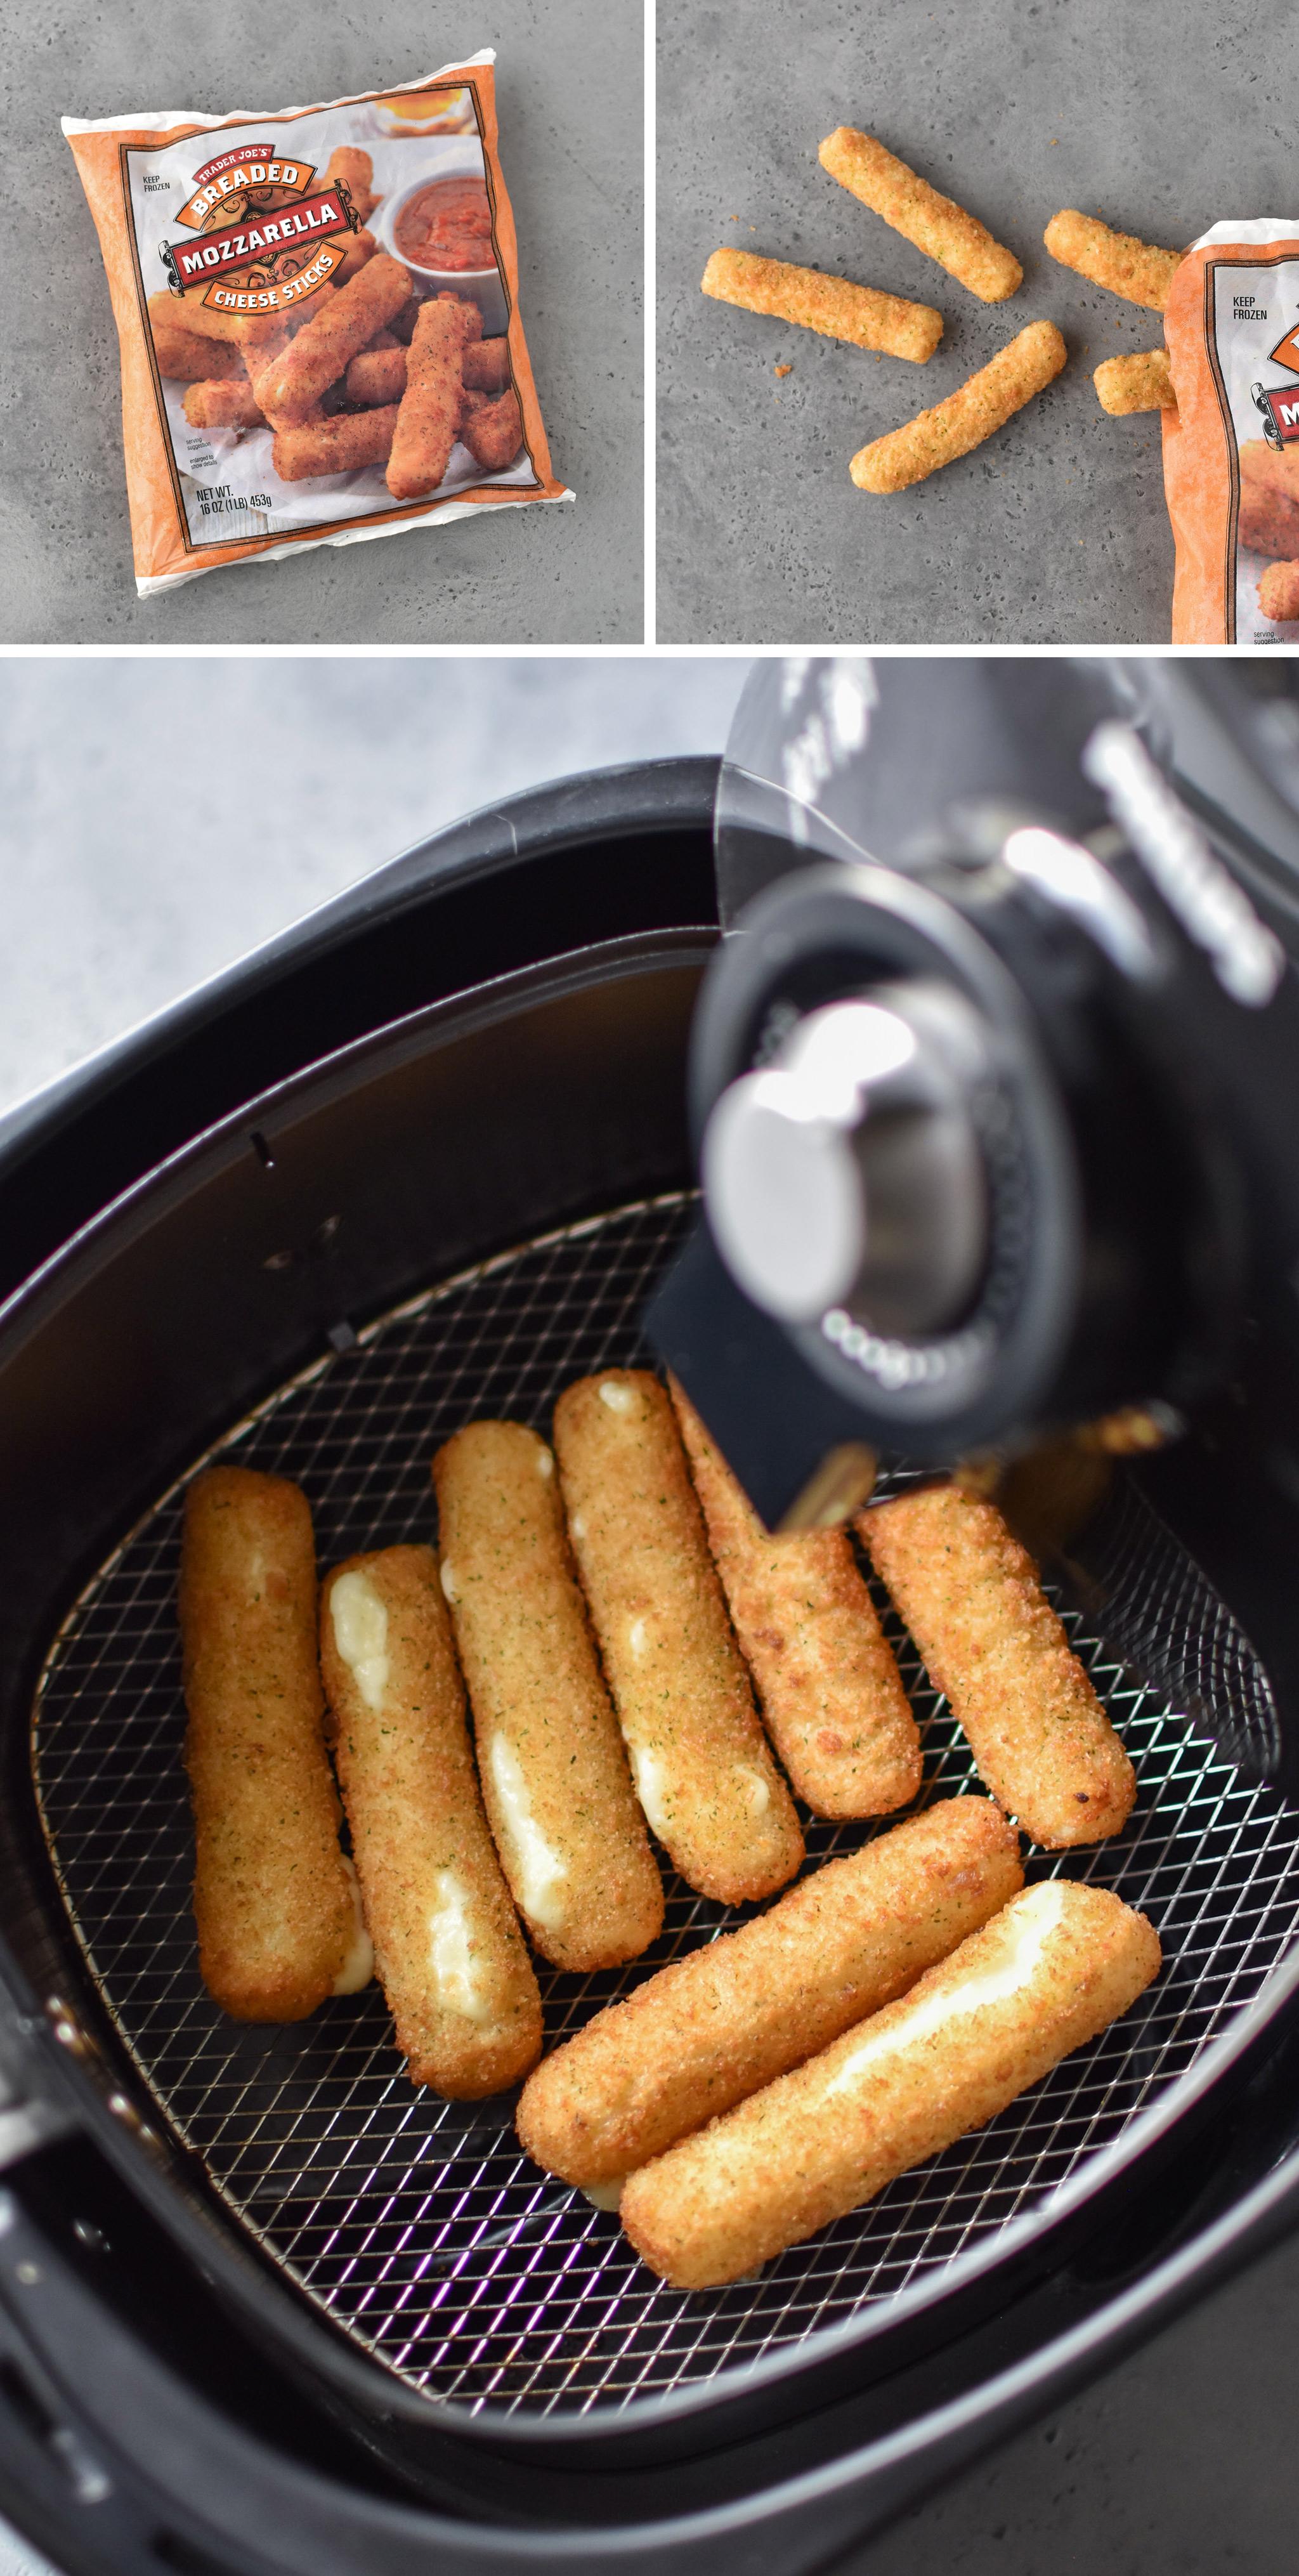 Mozzarella sticks made in the air fryer